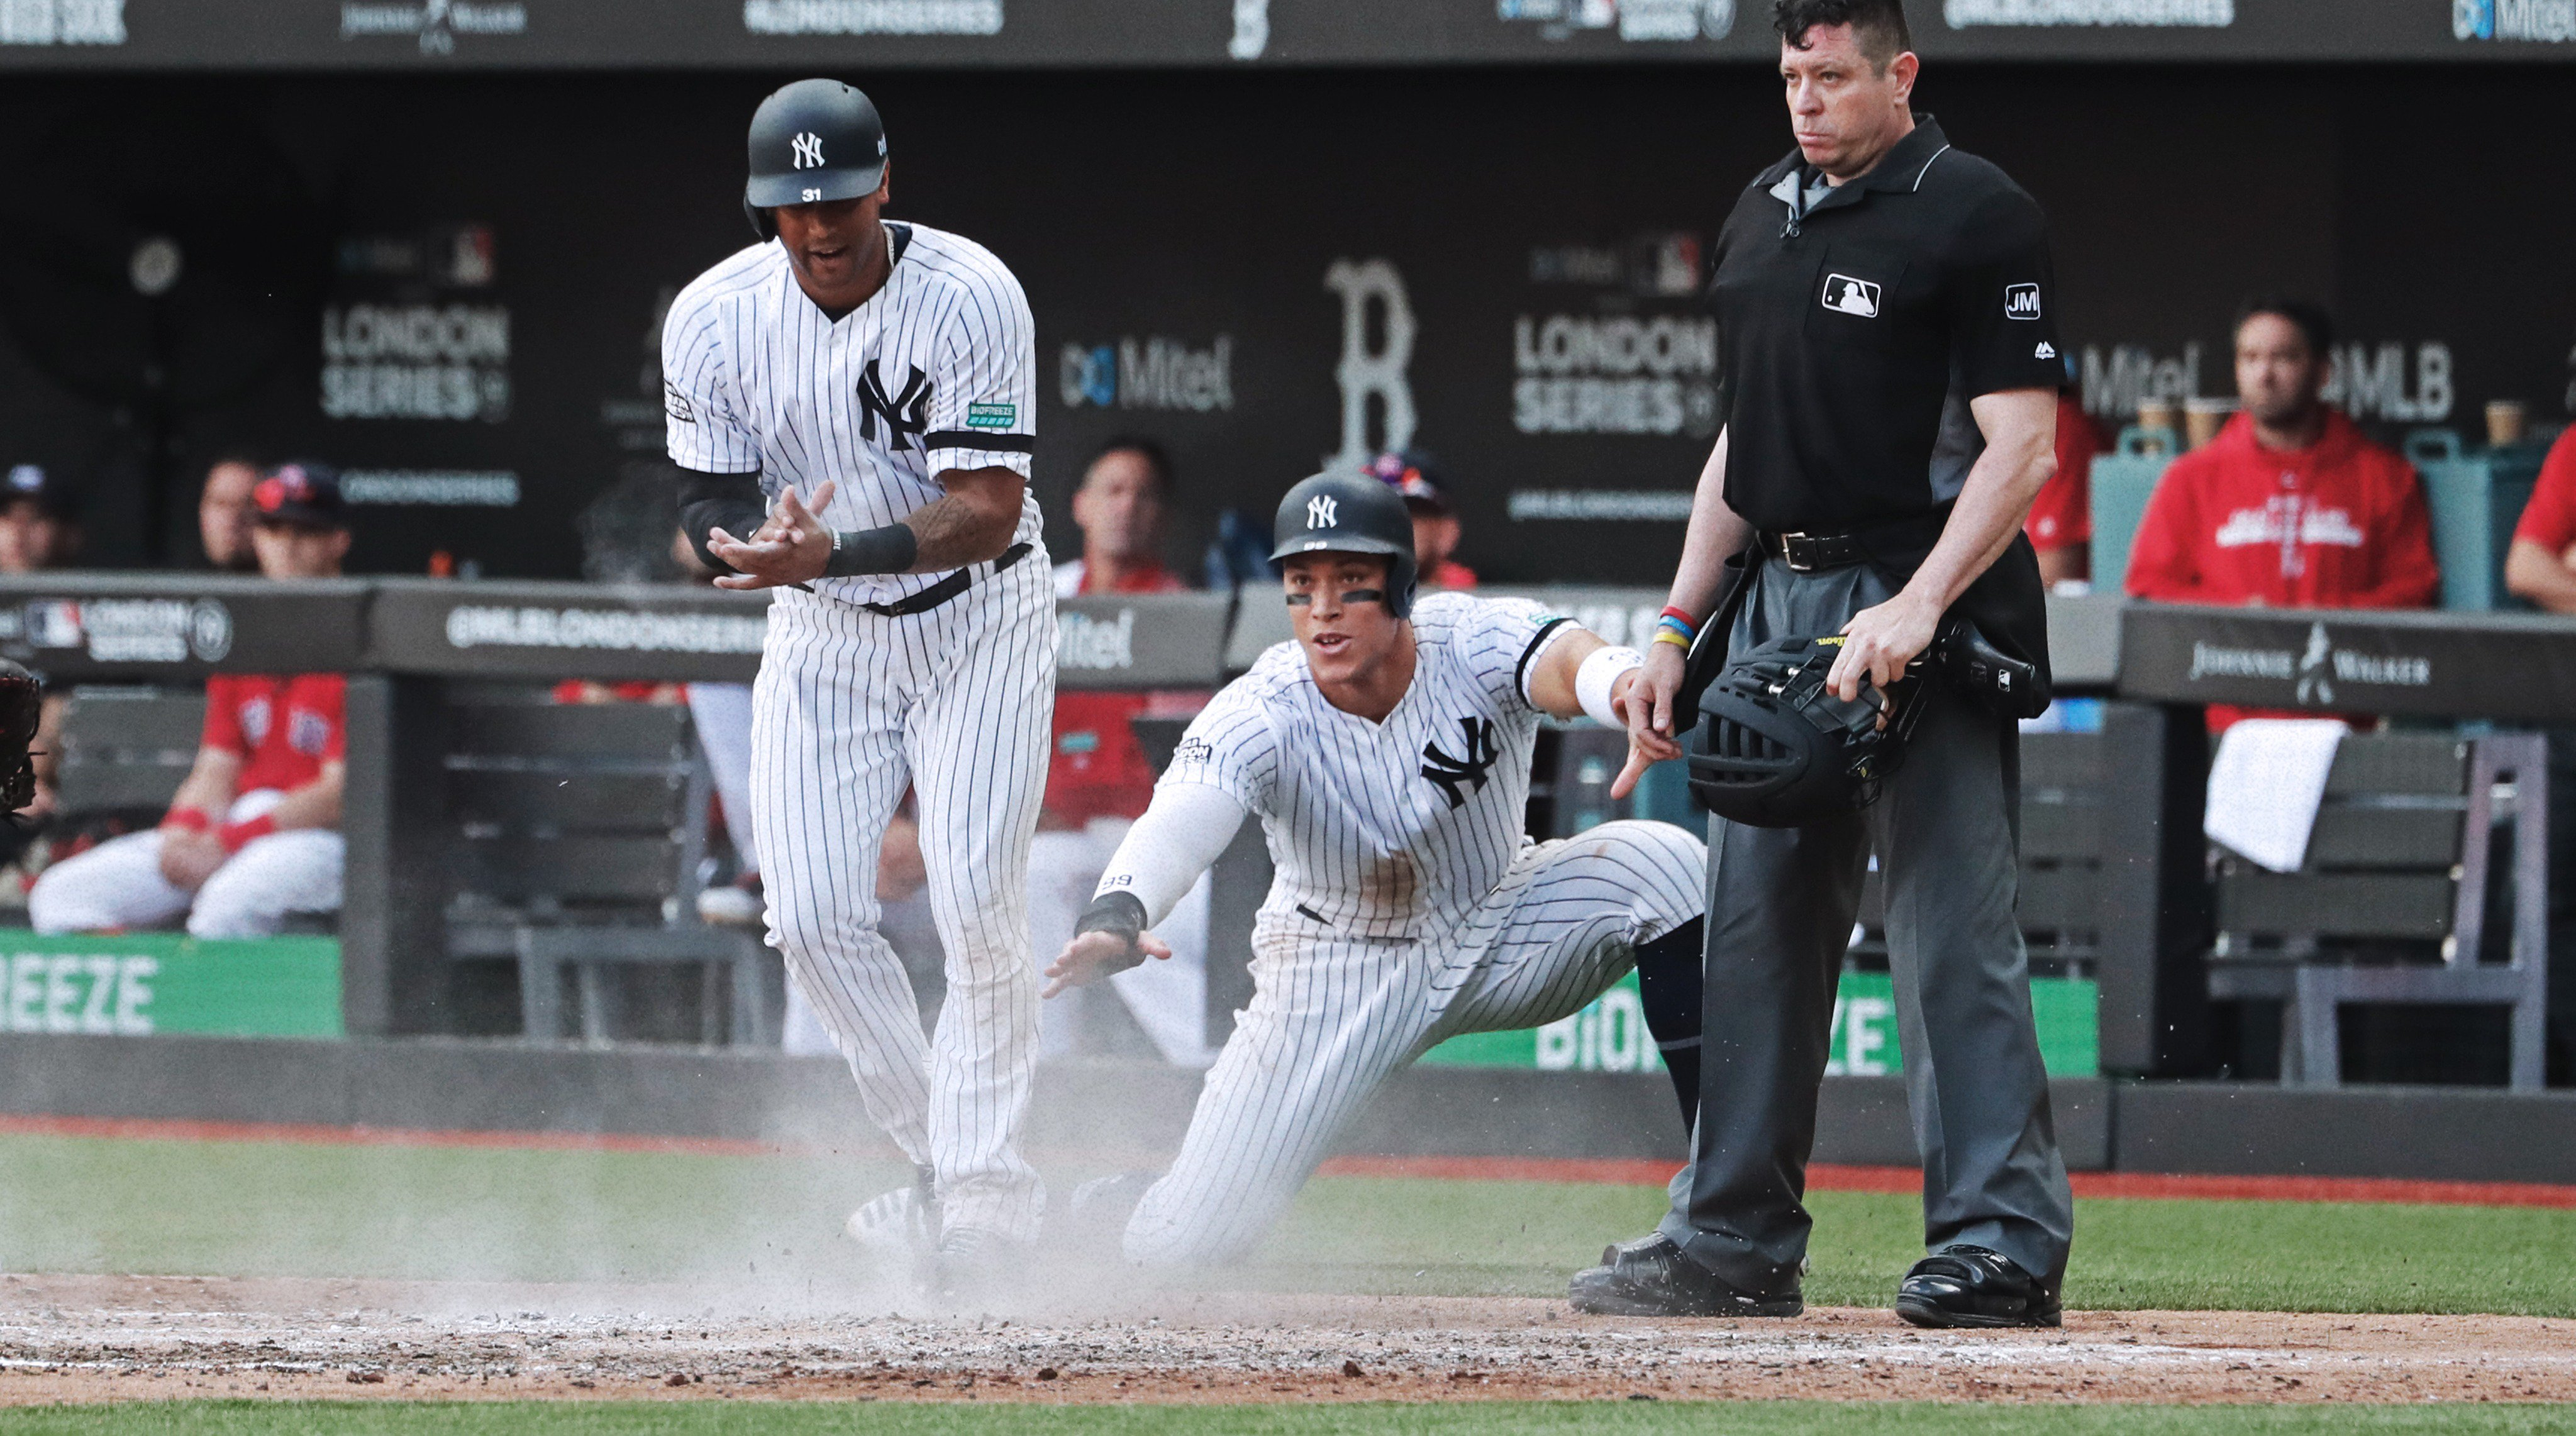 Yankees-Red Sox London Series